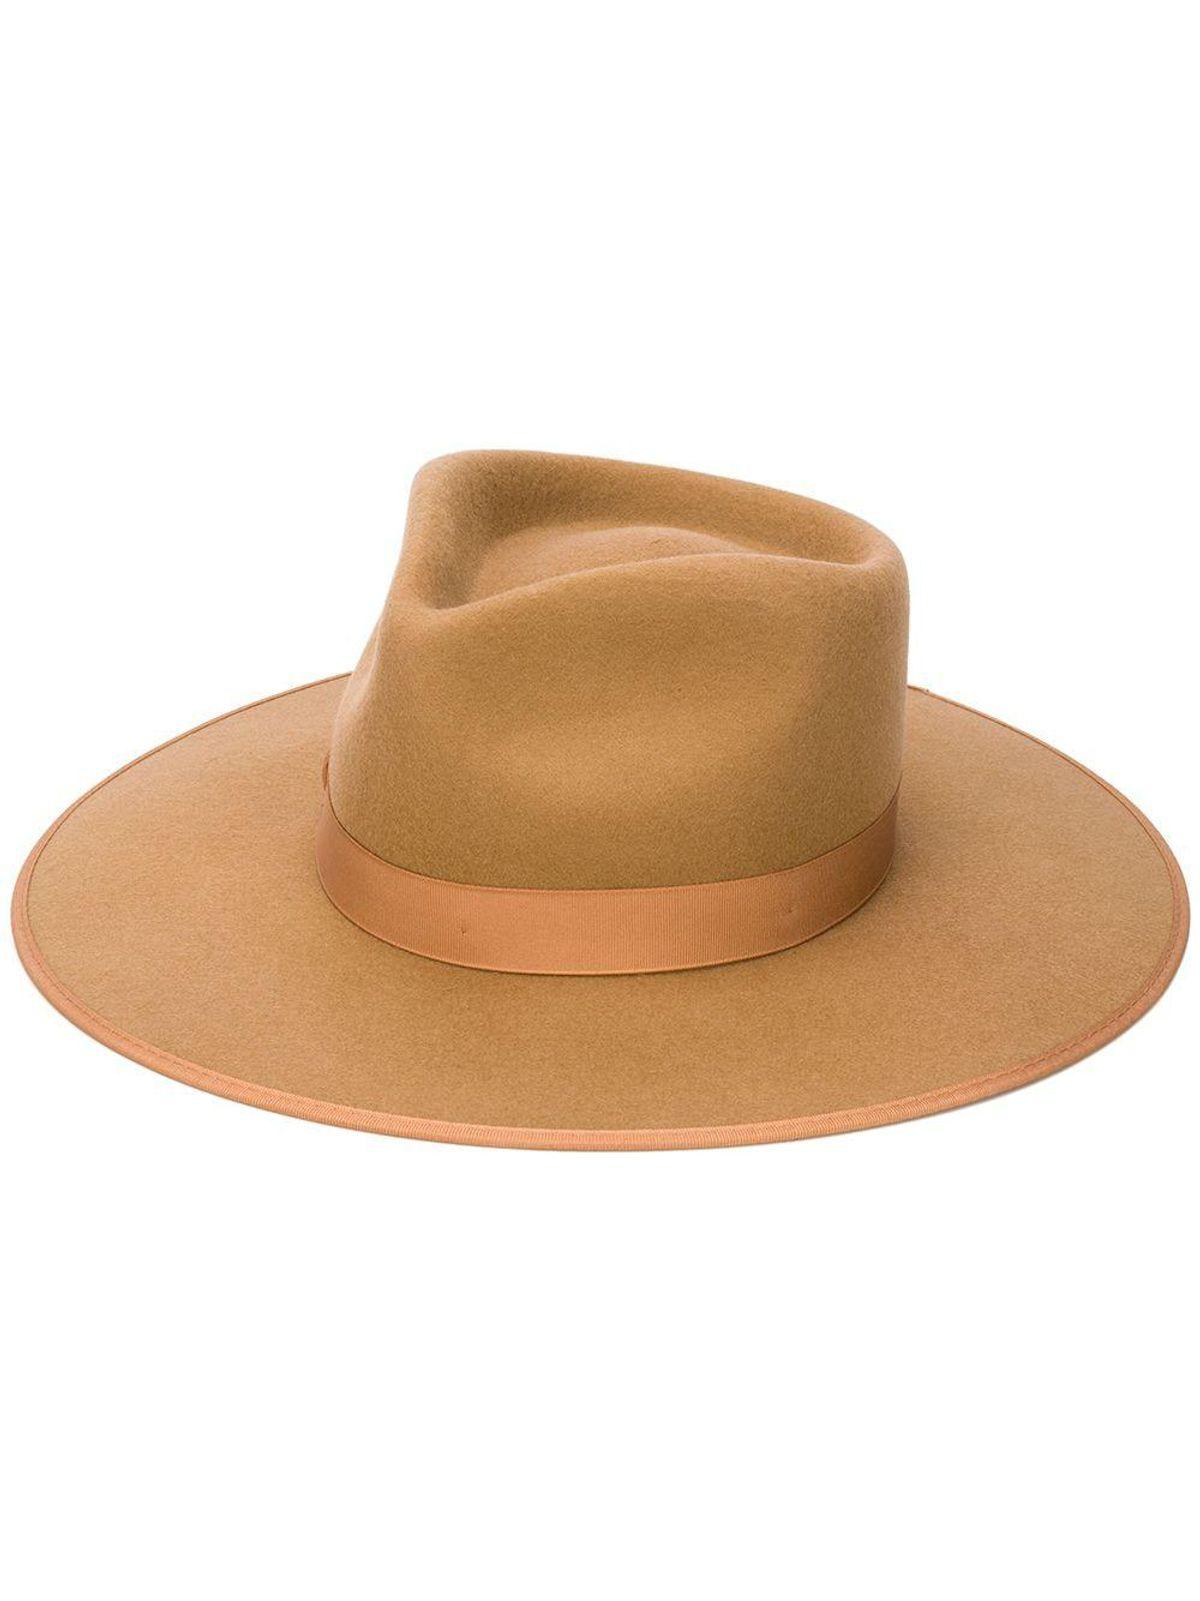 Rancher Fedora Hat